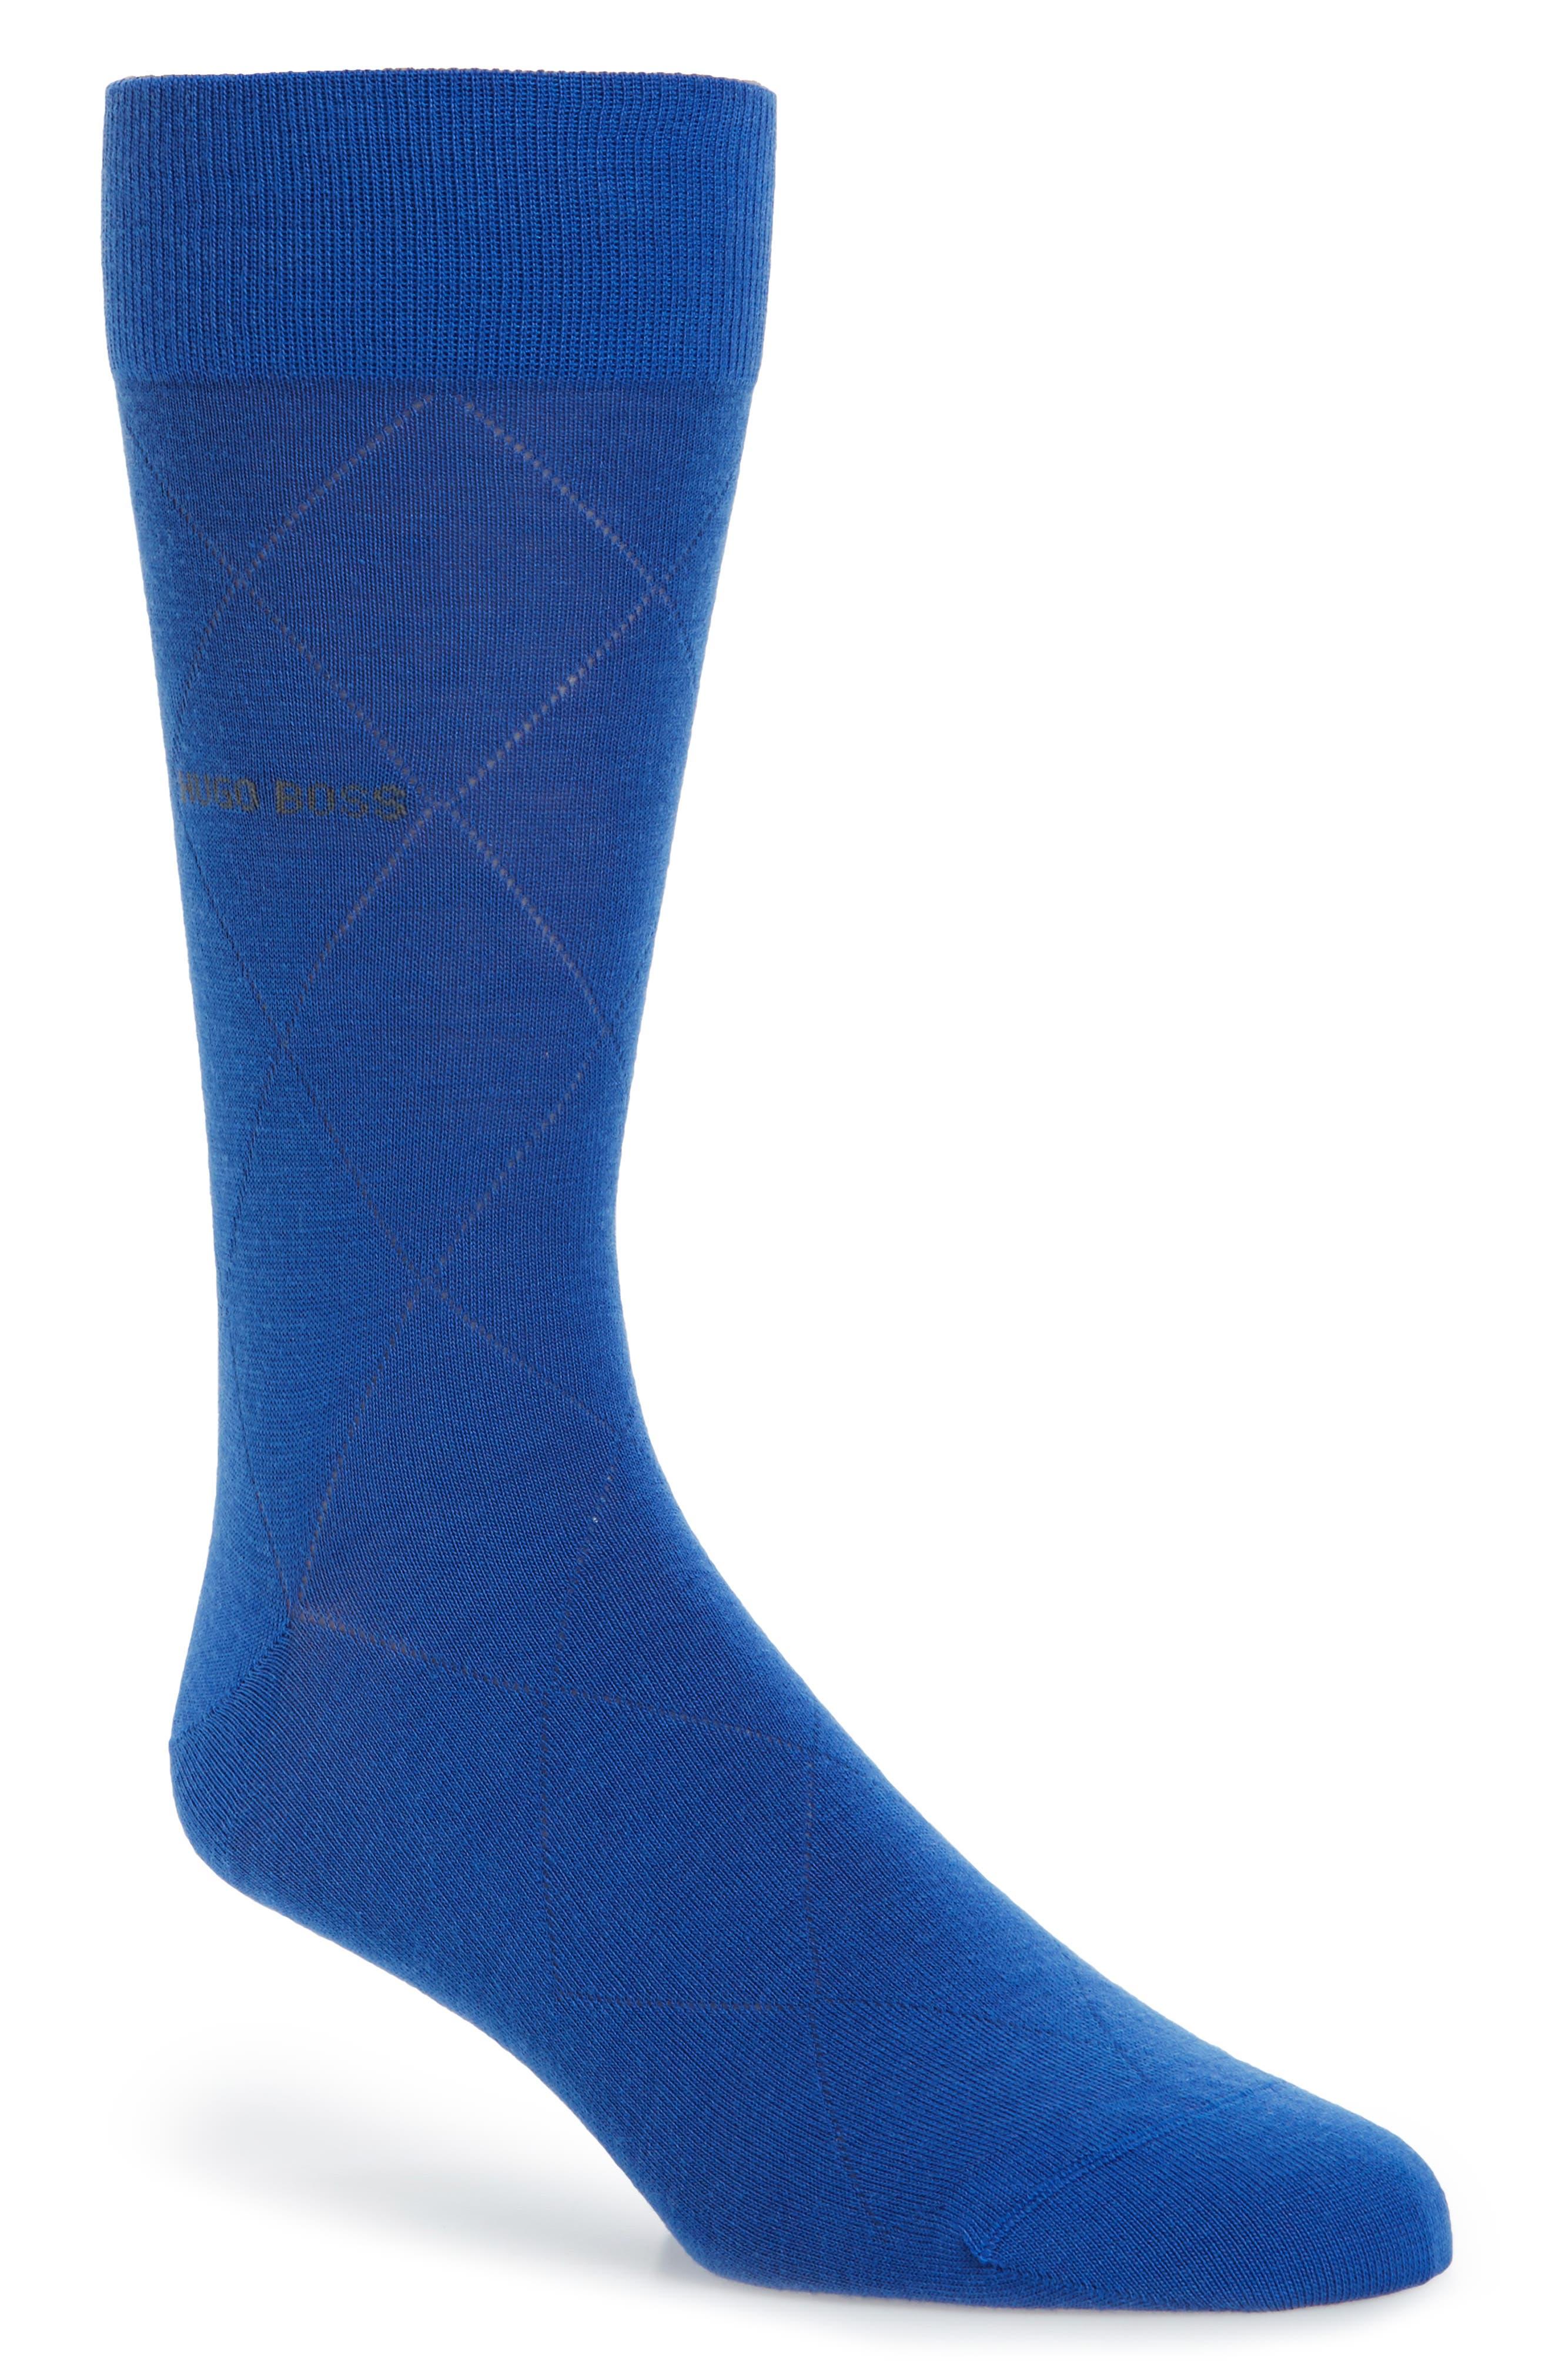 Main Image - BOSS Argyle Crew Socks